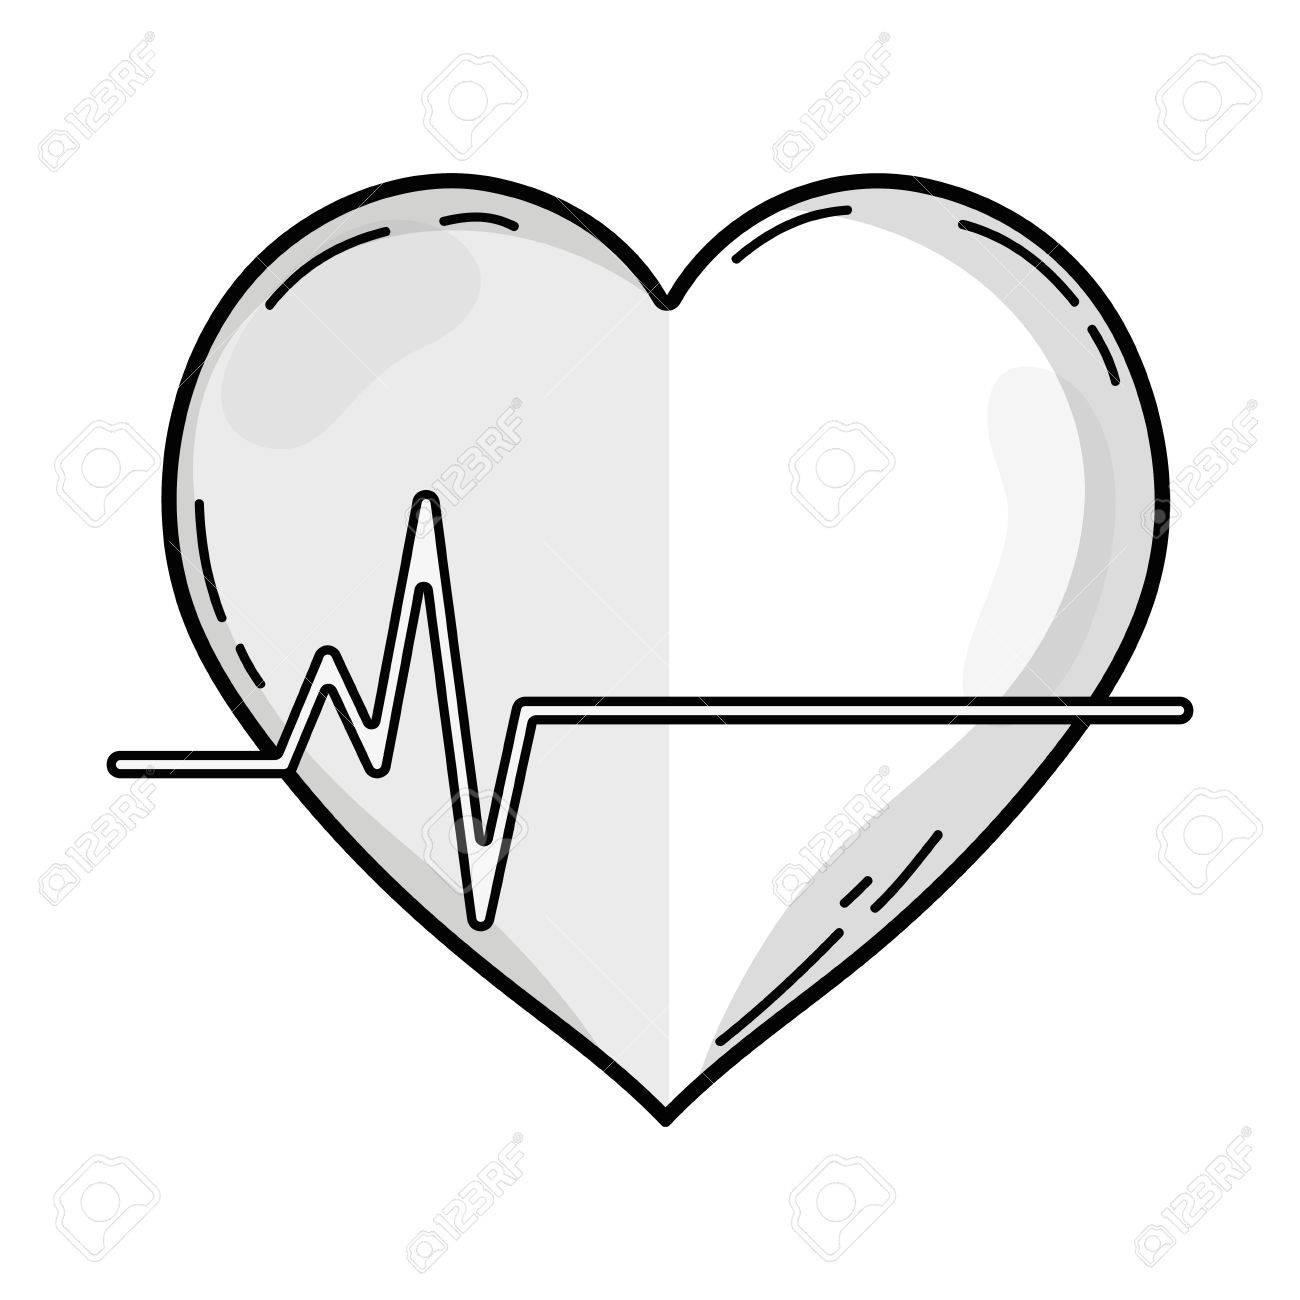 1300x1300 Outline Drawing Of Frequency Vital Cardiac Rhythm Heartbeat